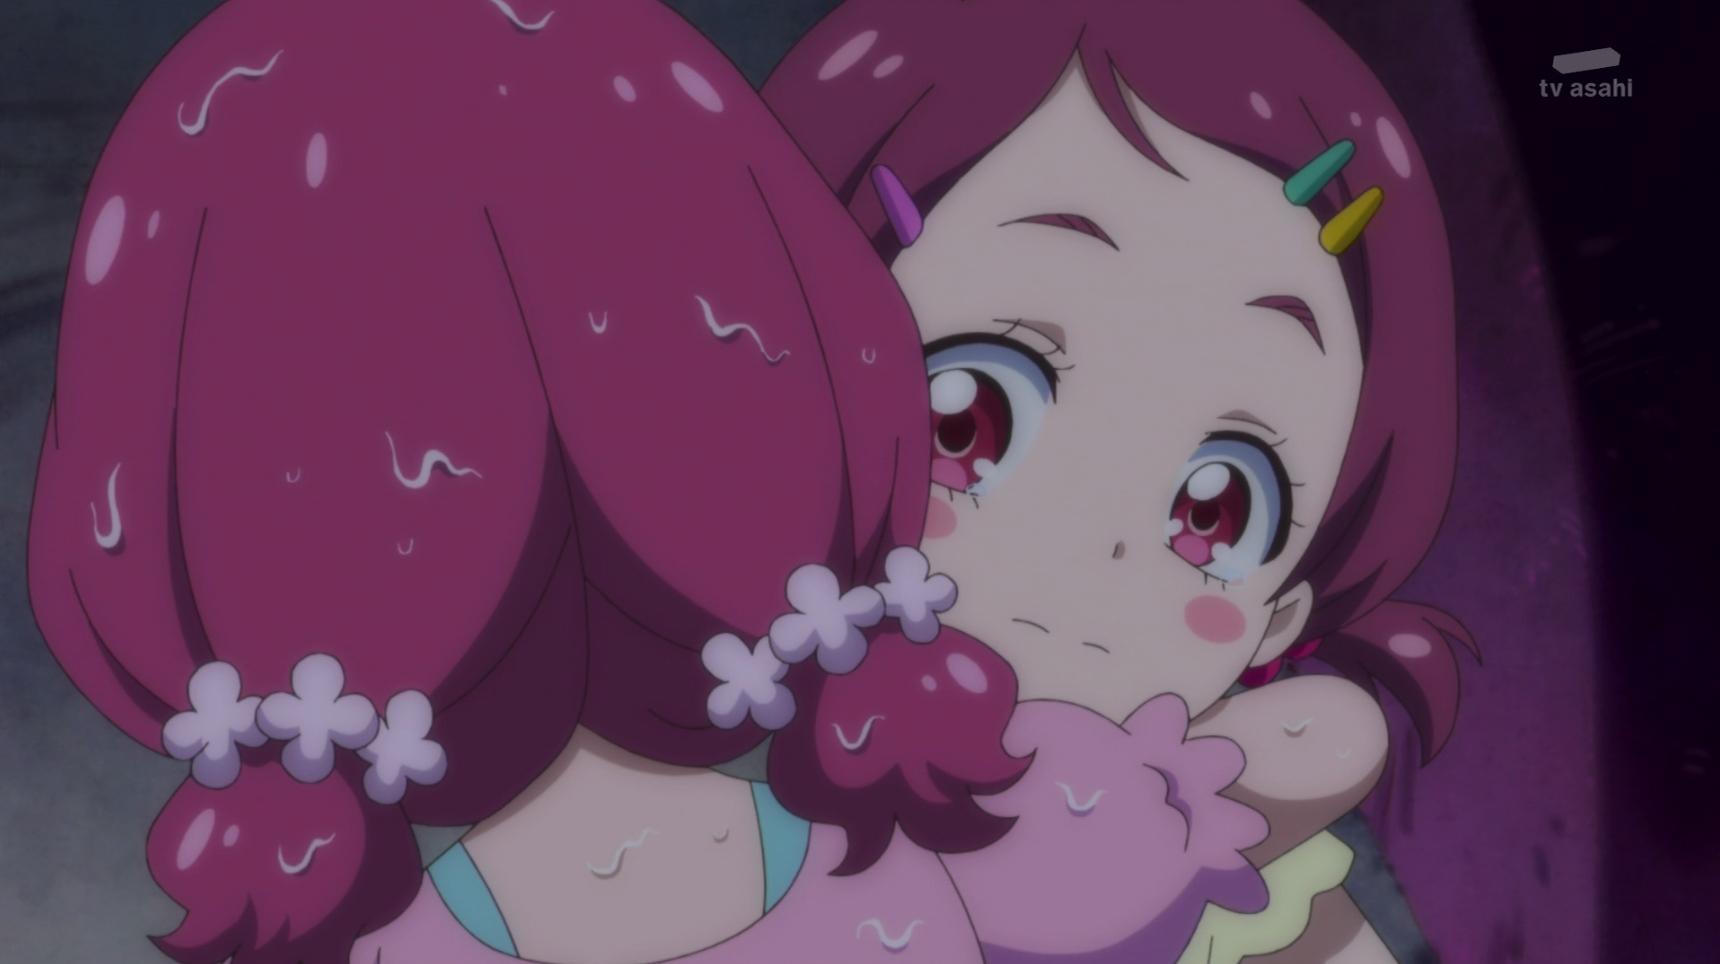 HUGっとプリキュア第34話感想ネタバレ1 (111)